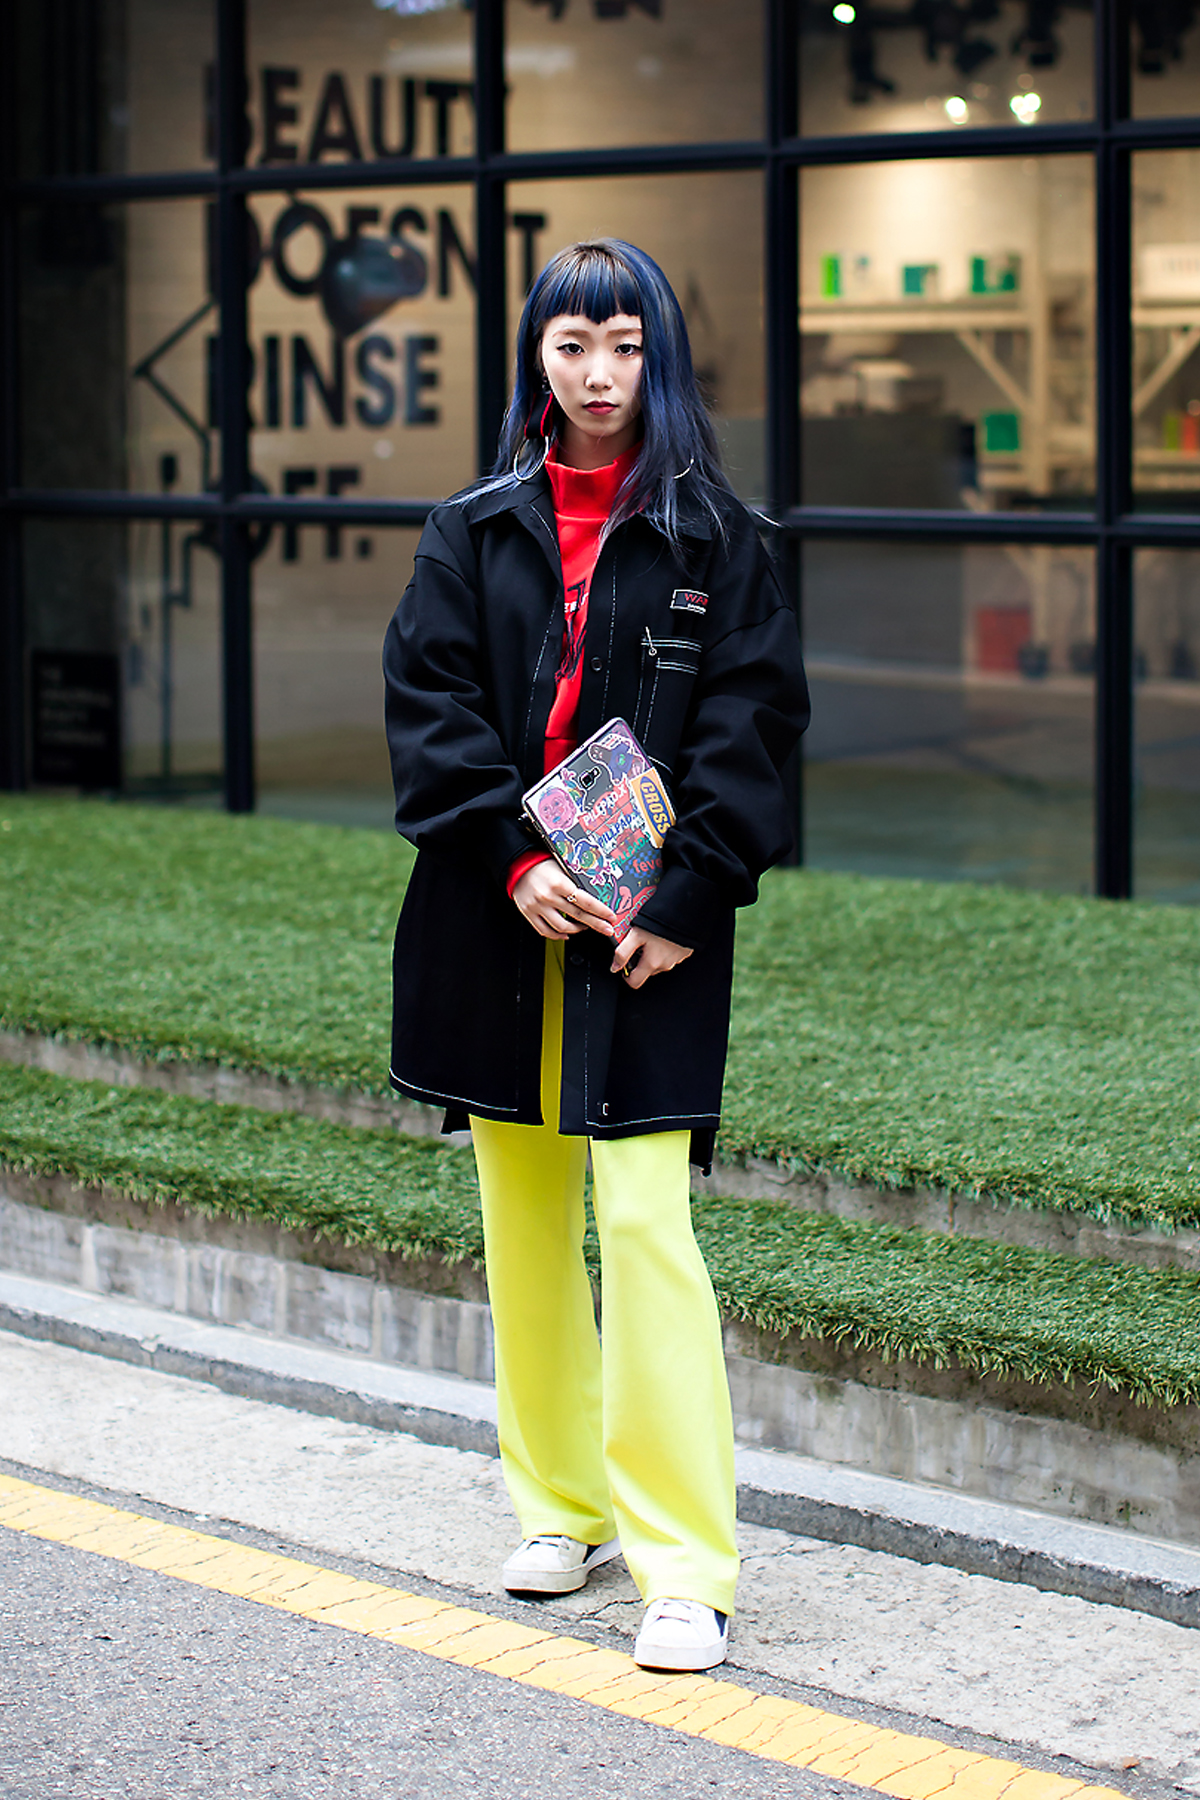 Nam Hyojung, Street Fashion 2017 in Seoul.jpg